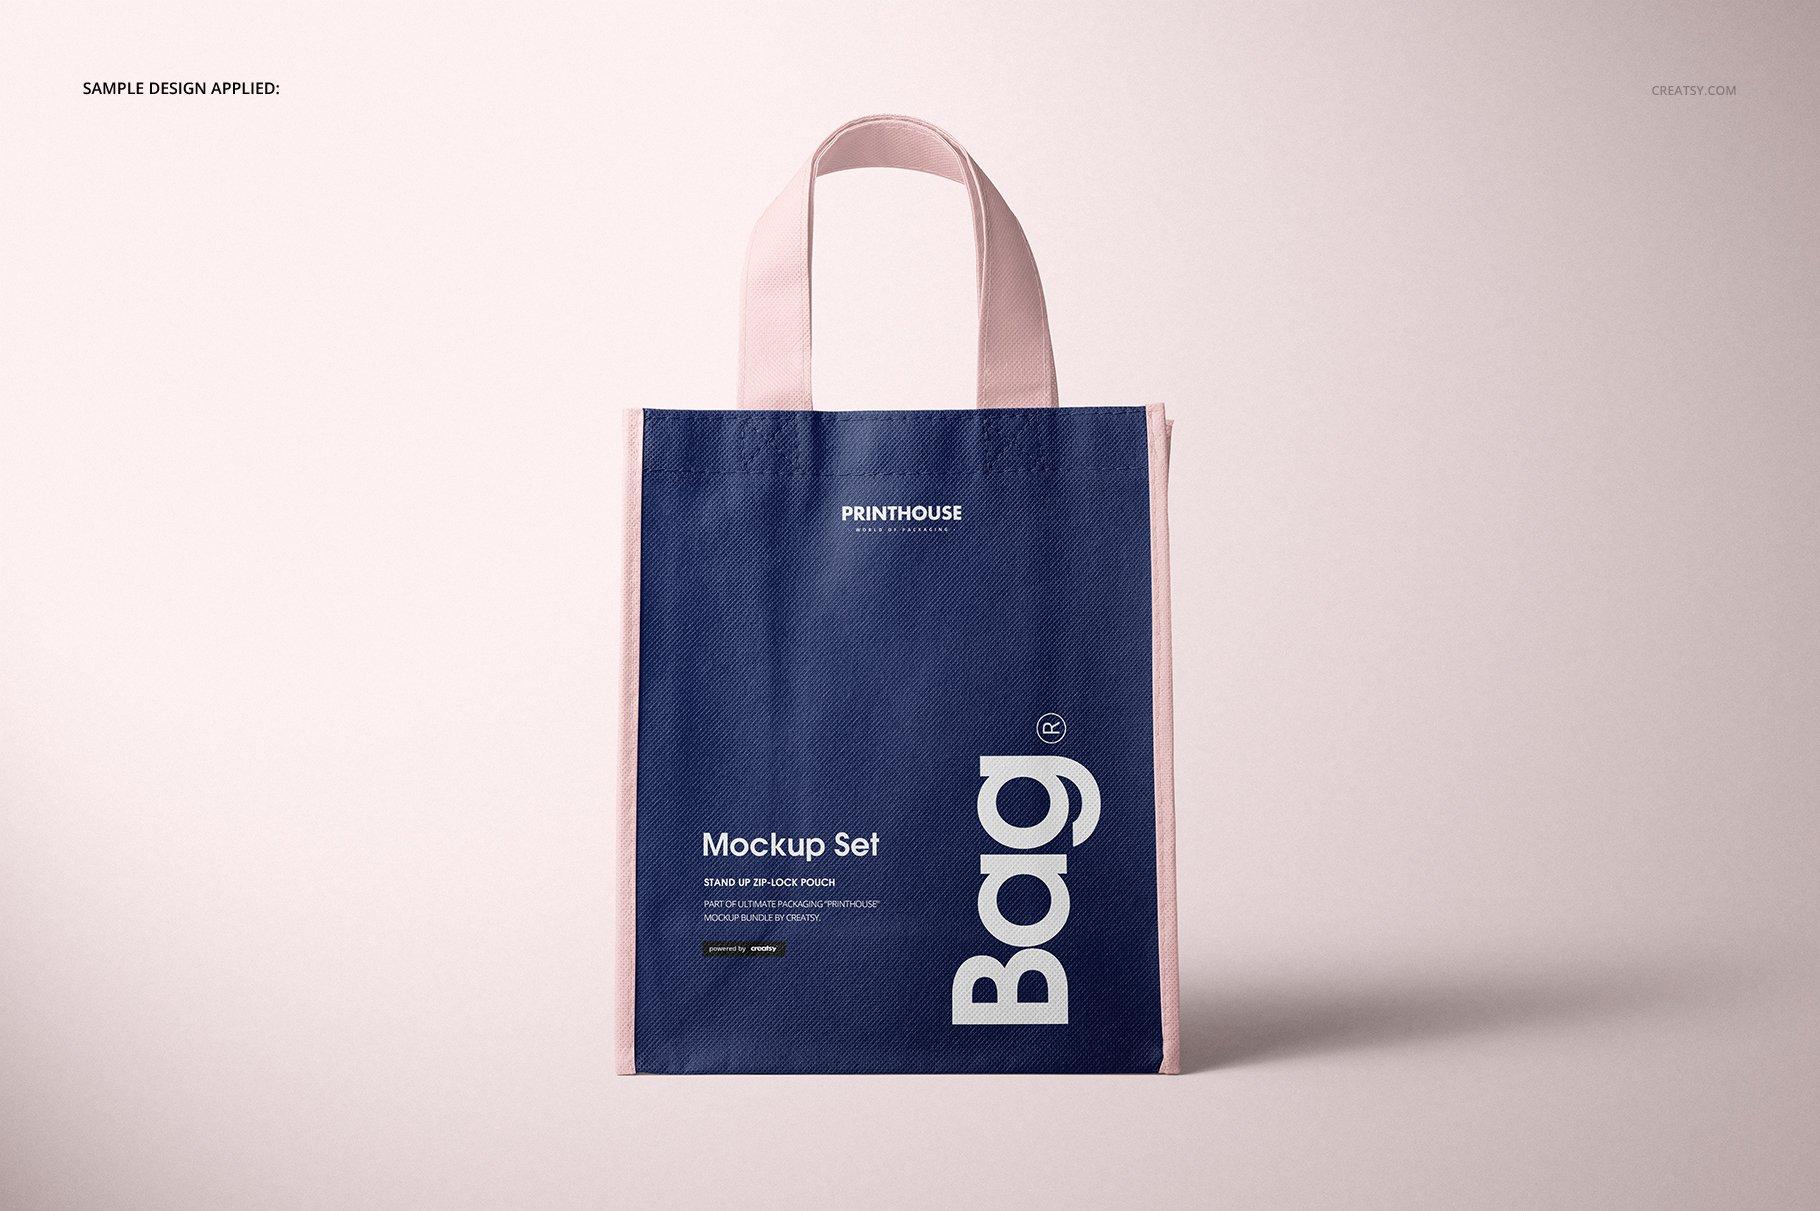 [淘宝购买] 无纺布袋手提袋设计展示样机模板套装 Non-Woven Tote Bag Mockup Set插图(5)